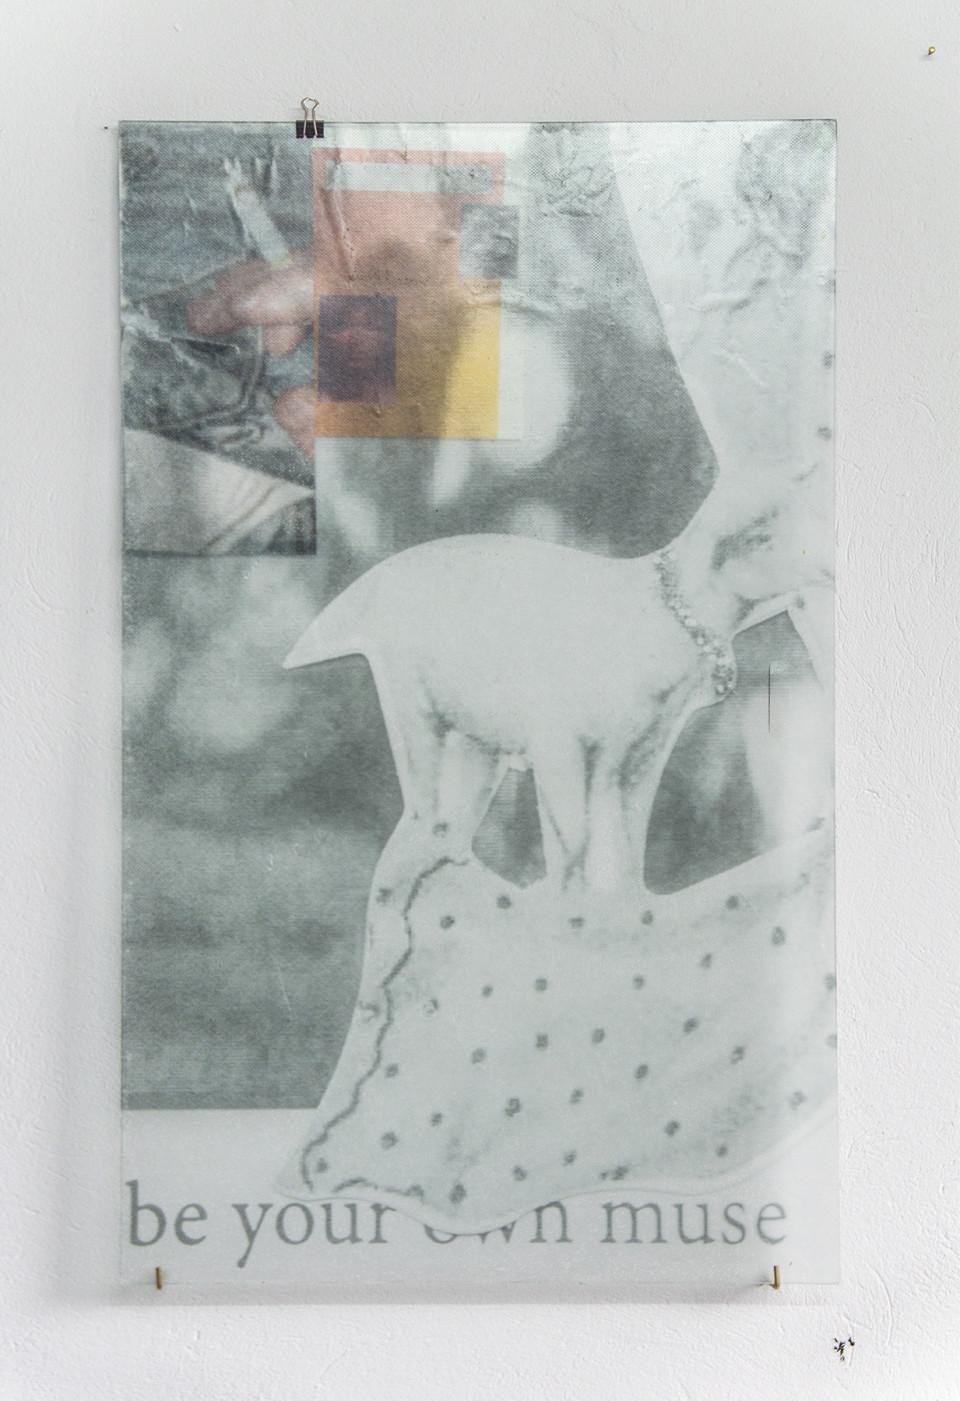 Nana Mandl my very own muse II, 2019 mixed media on glass 80 x 50 cm 31 1/2 x 19 3/4 in